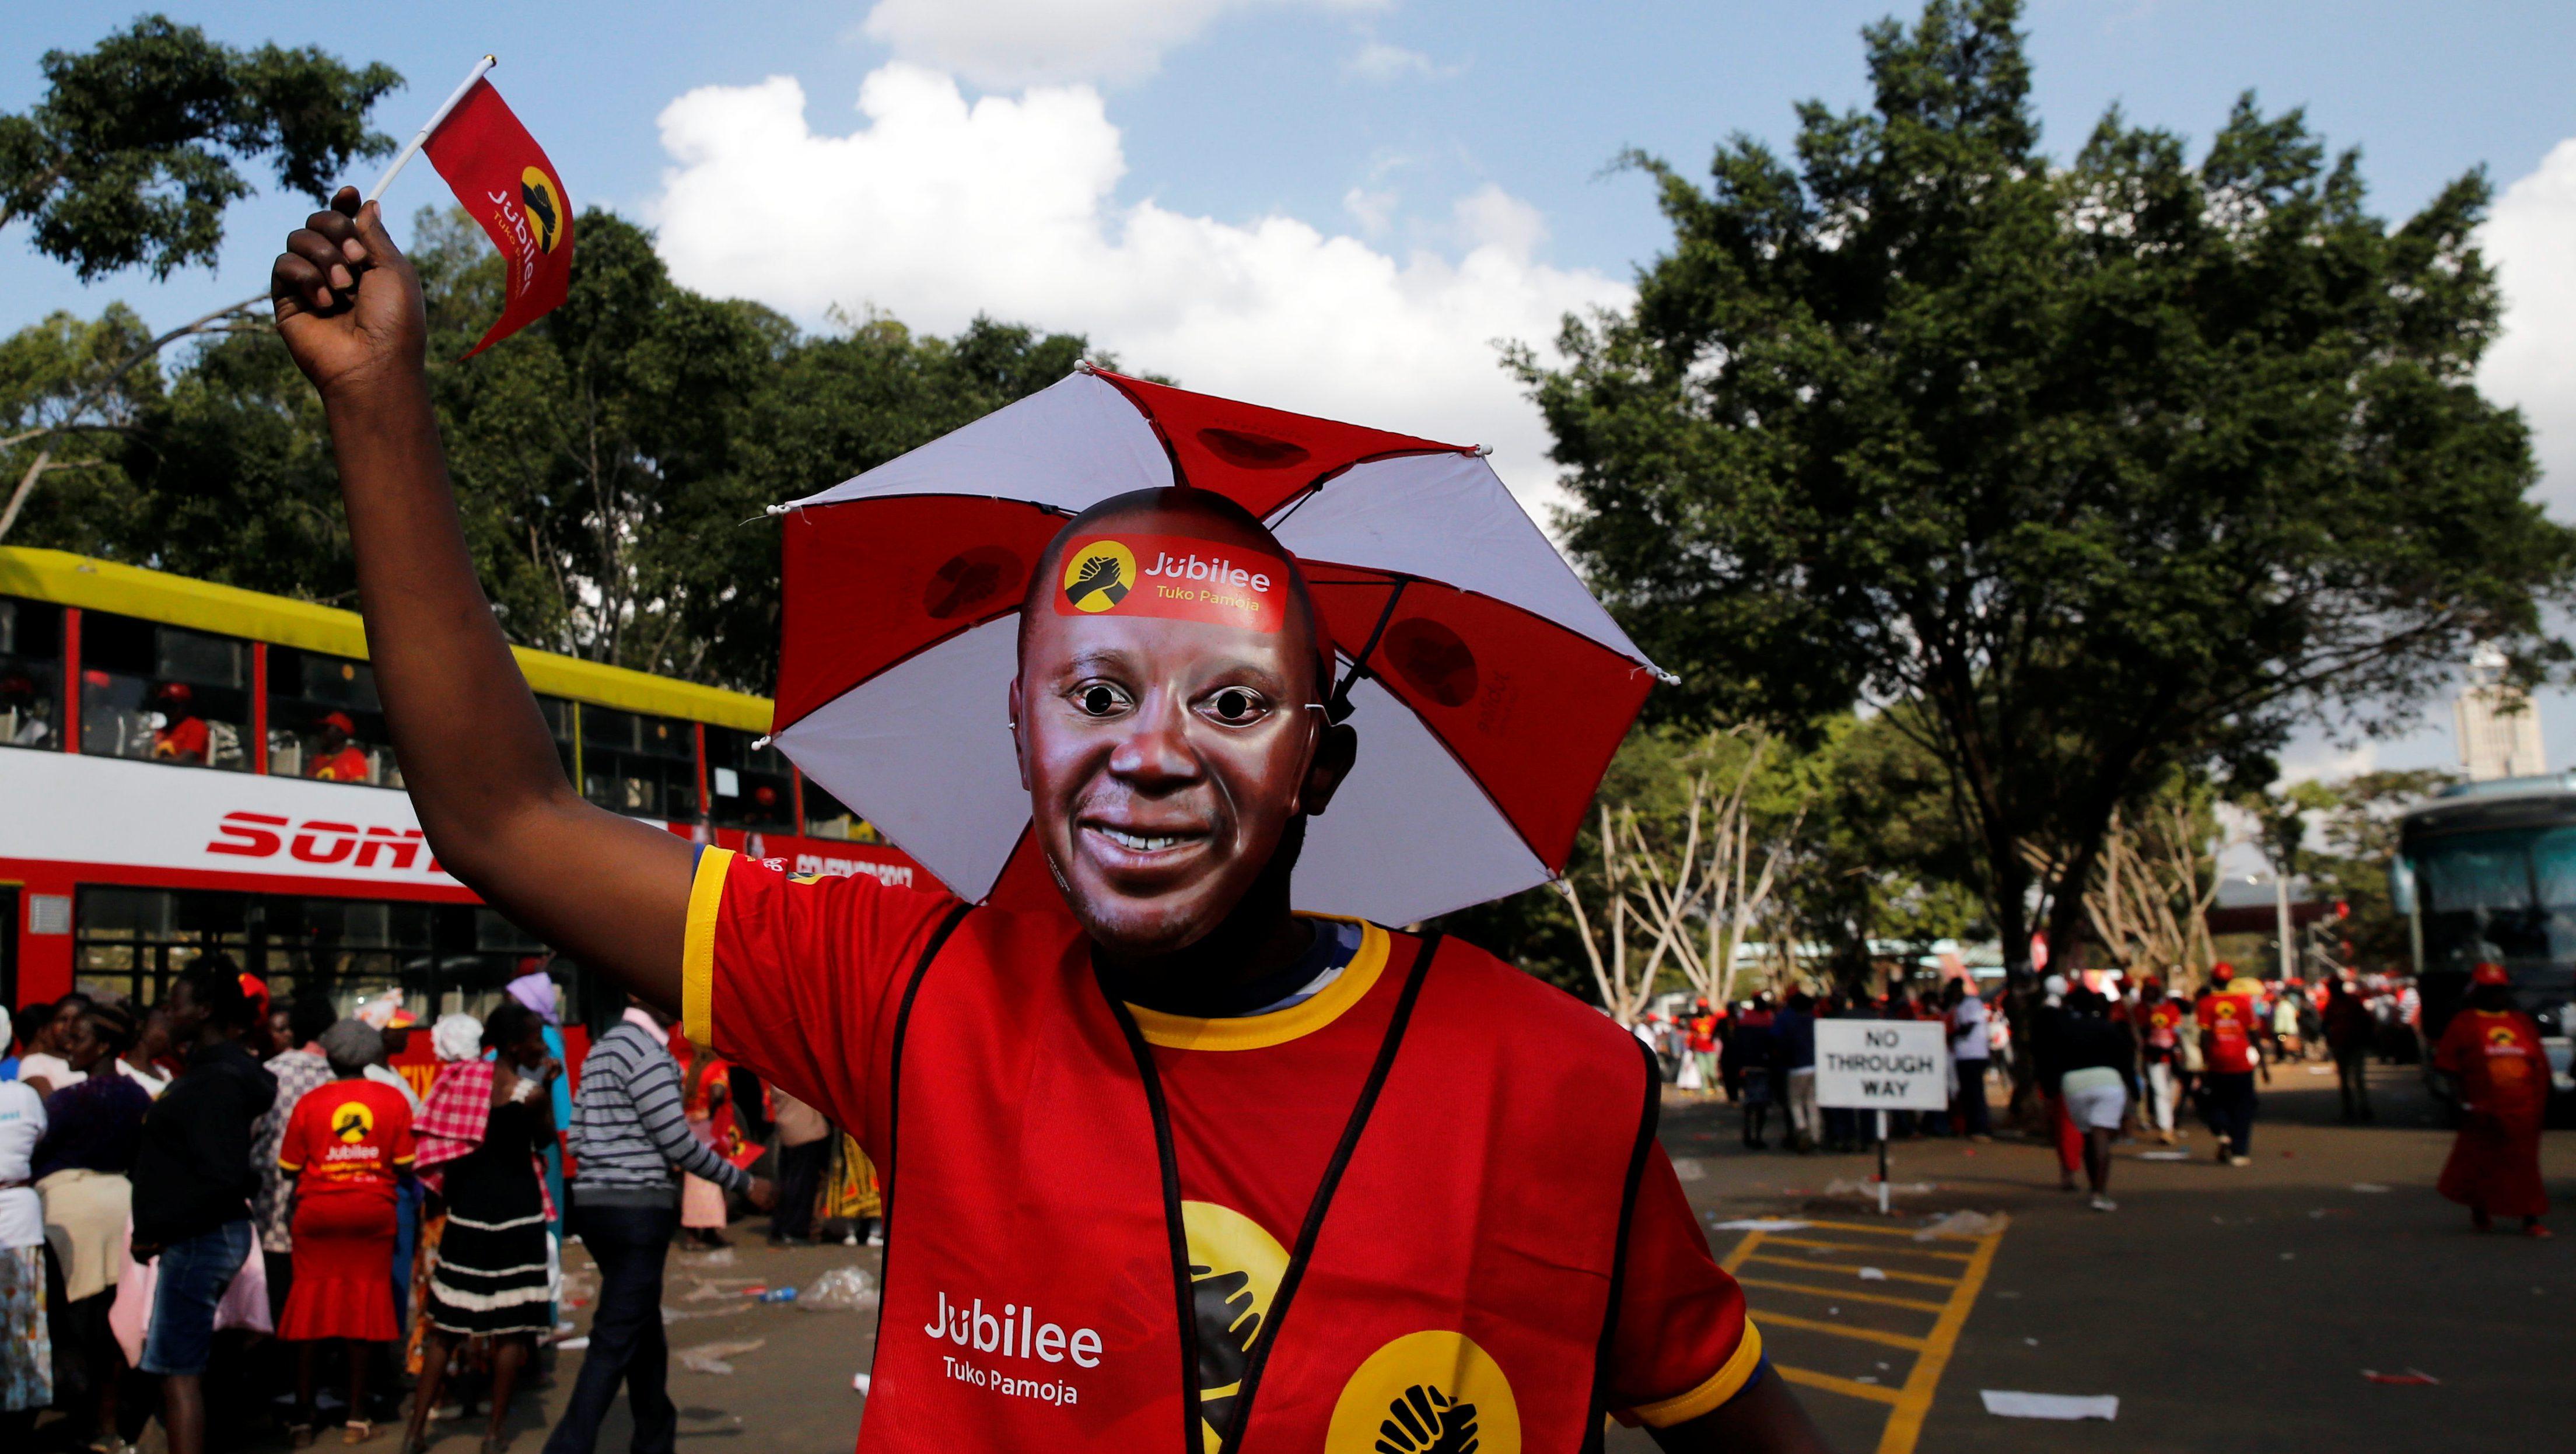 A supporter of Kenya's President Uhuru Kenyatta wears his mask during a Jubilee Party campaign rally at Uhuru park in Nairobi, Kenya August 4, 2017.